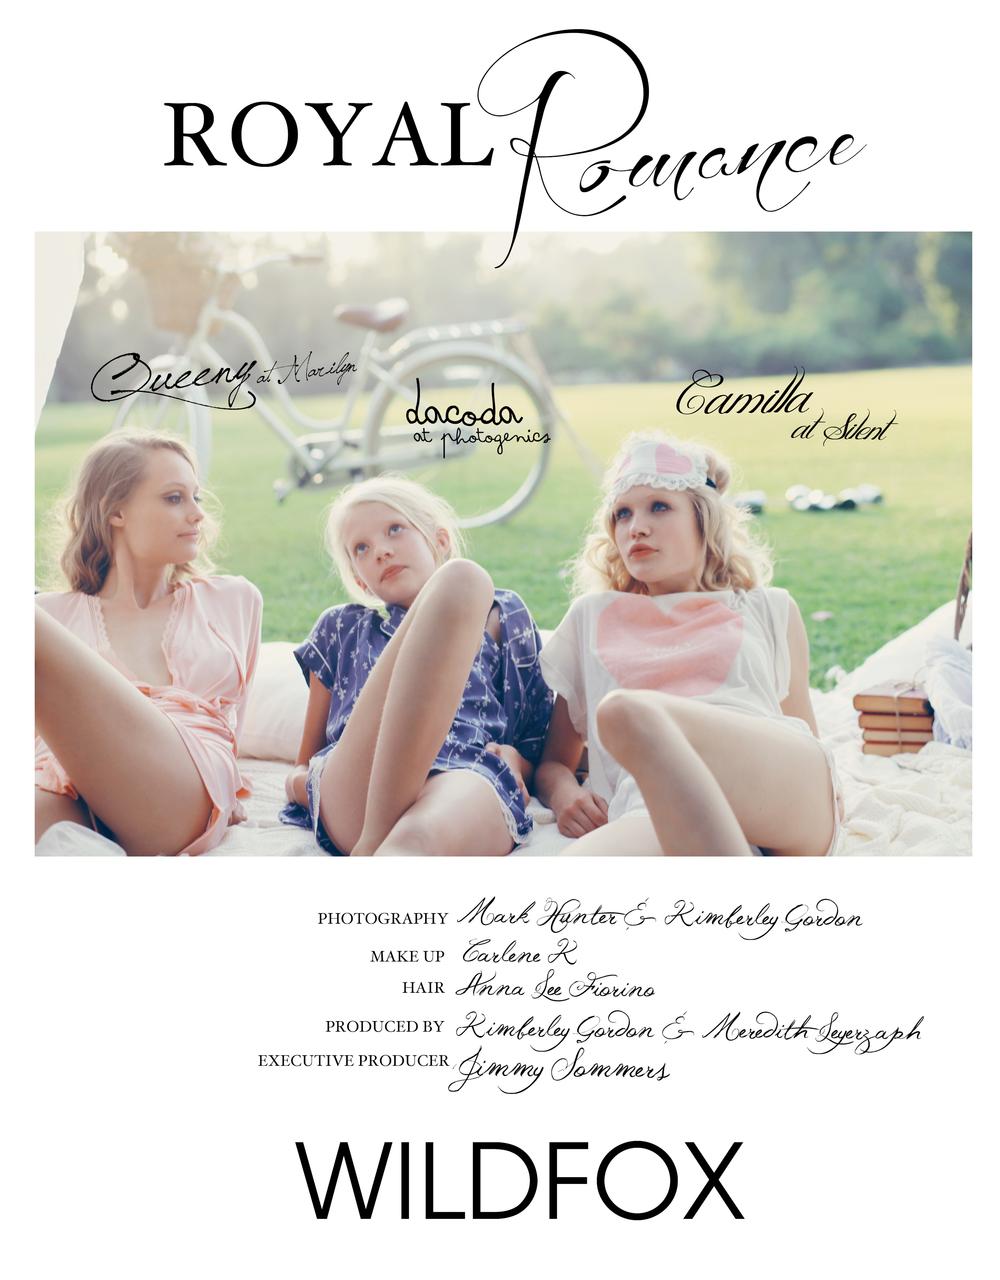 SUMMER_ROYAL_ROMANCE_FOX_BOOK-2.jpg